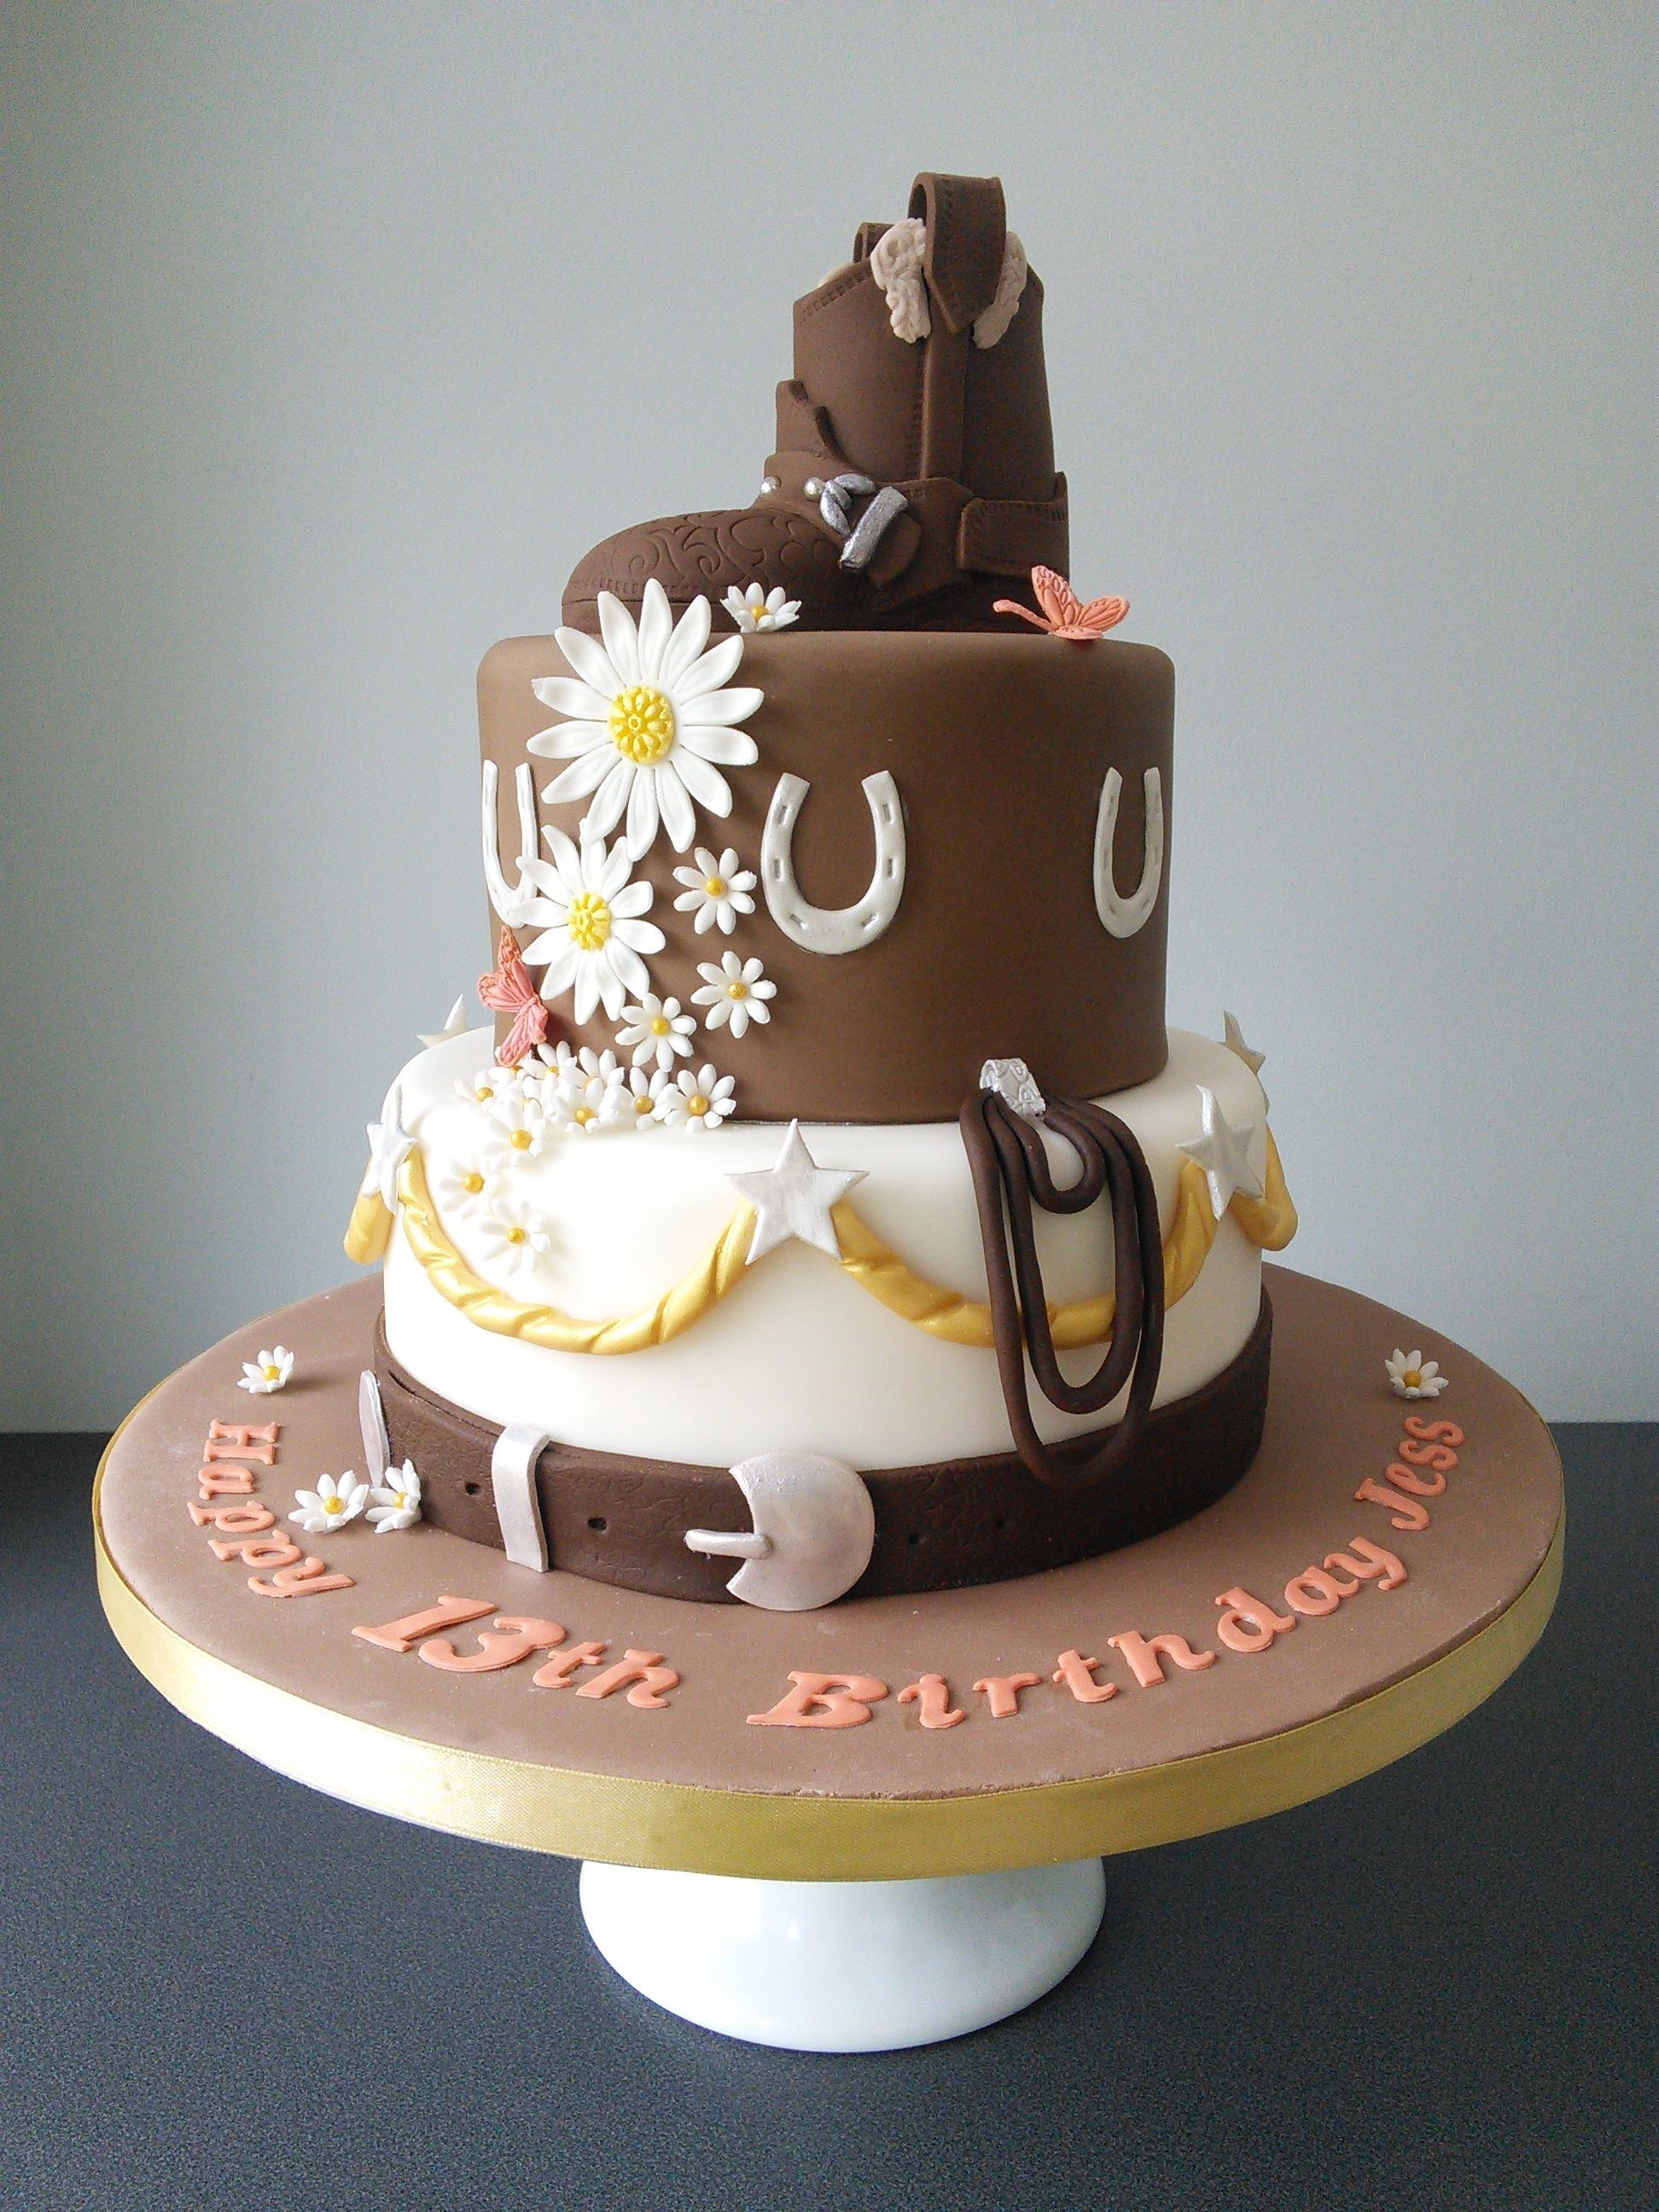 Stupendous 27 Elegant Image Of Cowgirl Birthday Cakes Cowgirl Kuchen Personalised Birthday Cards Bromeletsinfo